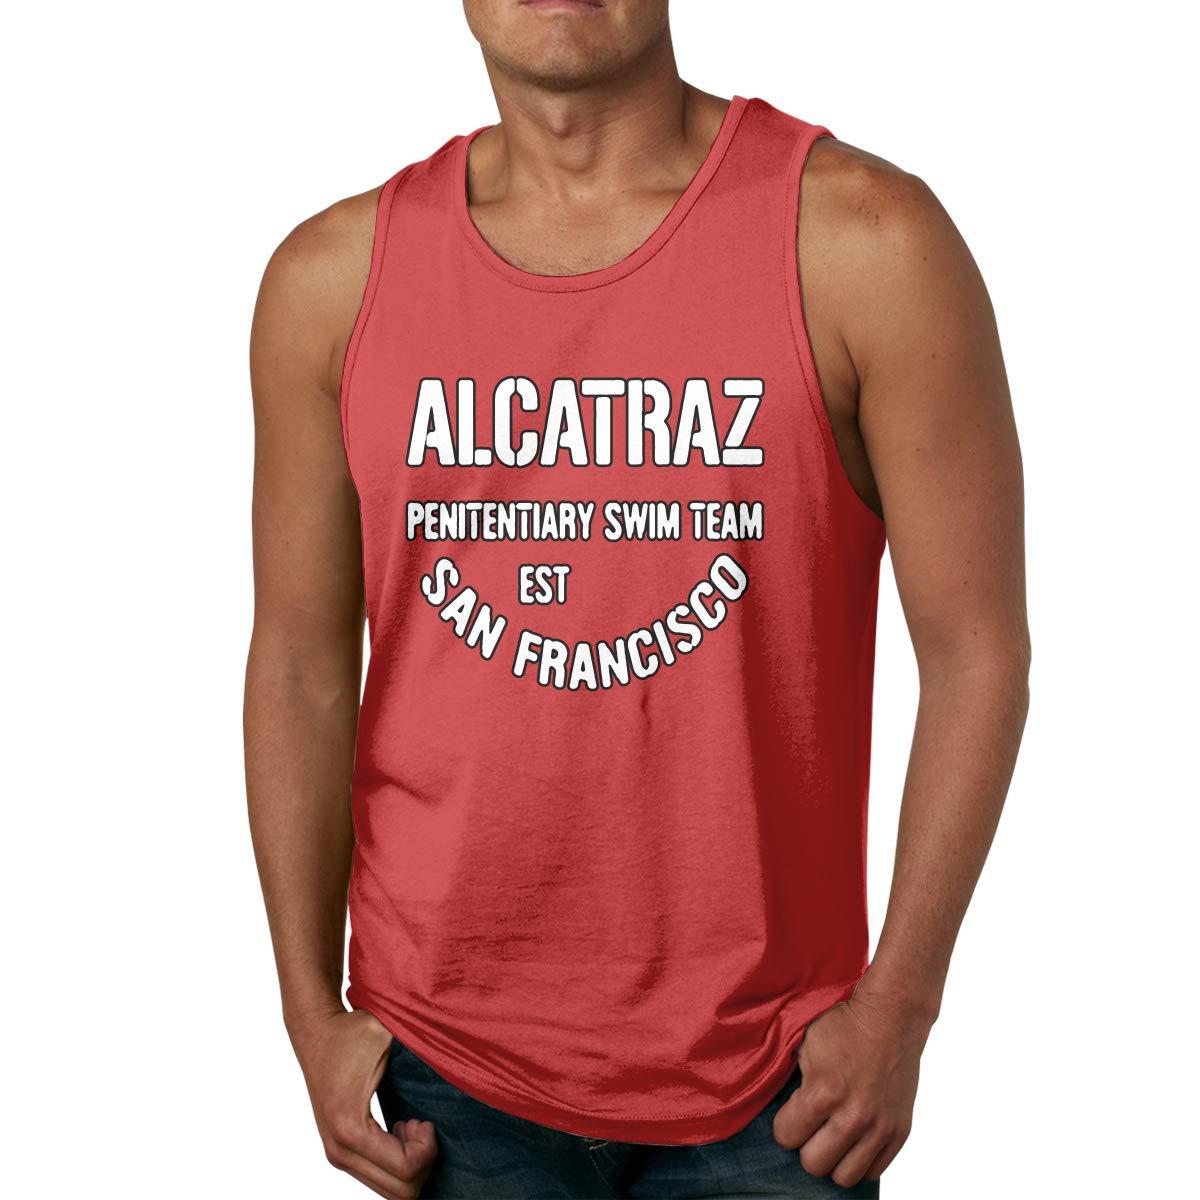 79155df75249d5 Amazon.com  Alcatraz Penitentiary Swim Team San Francisco Men s Casual Tank  Top Gym Sleeveless Vest Shirt  Clothing